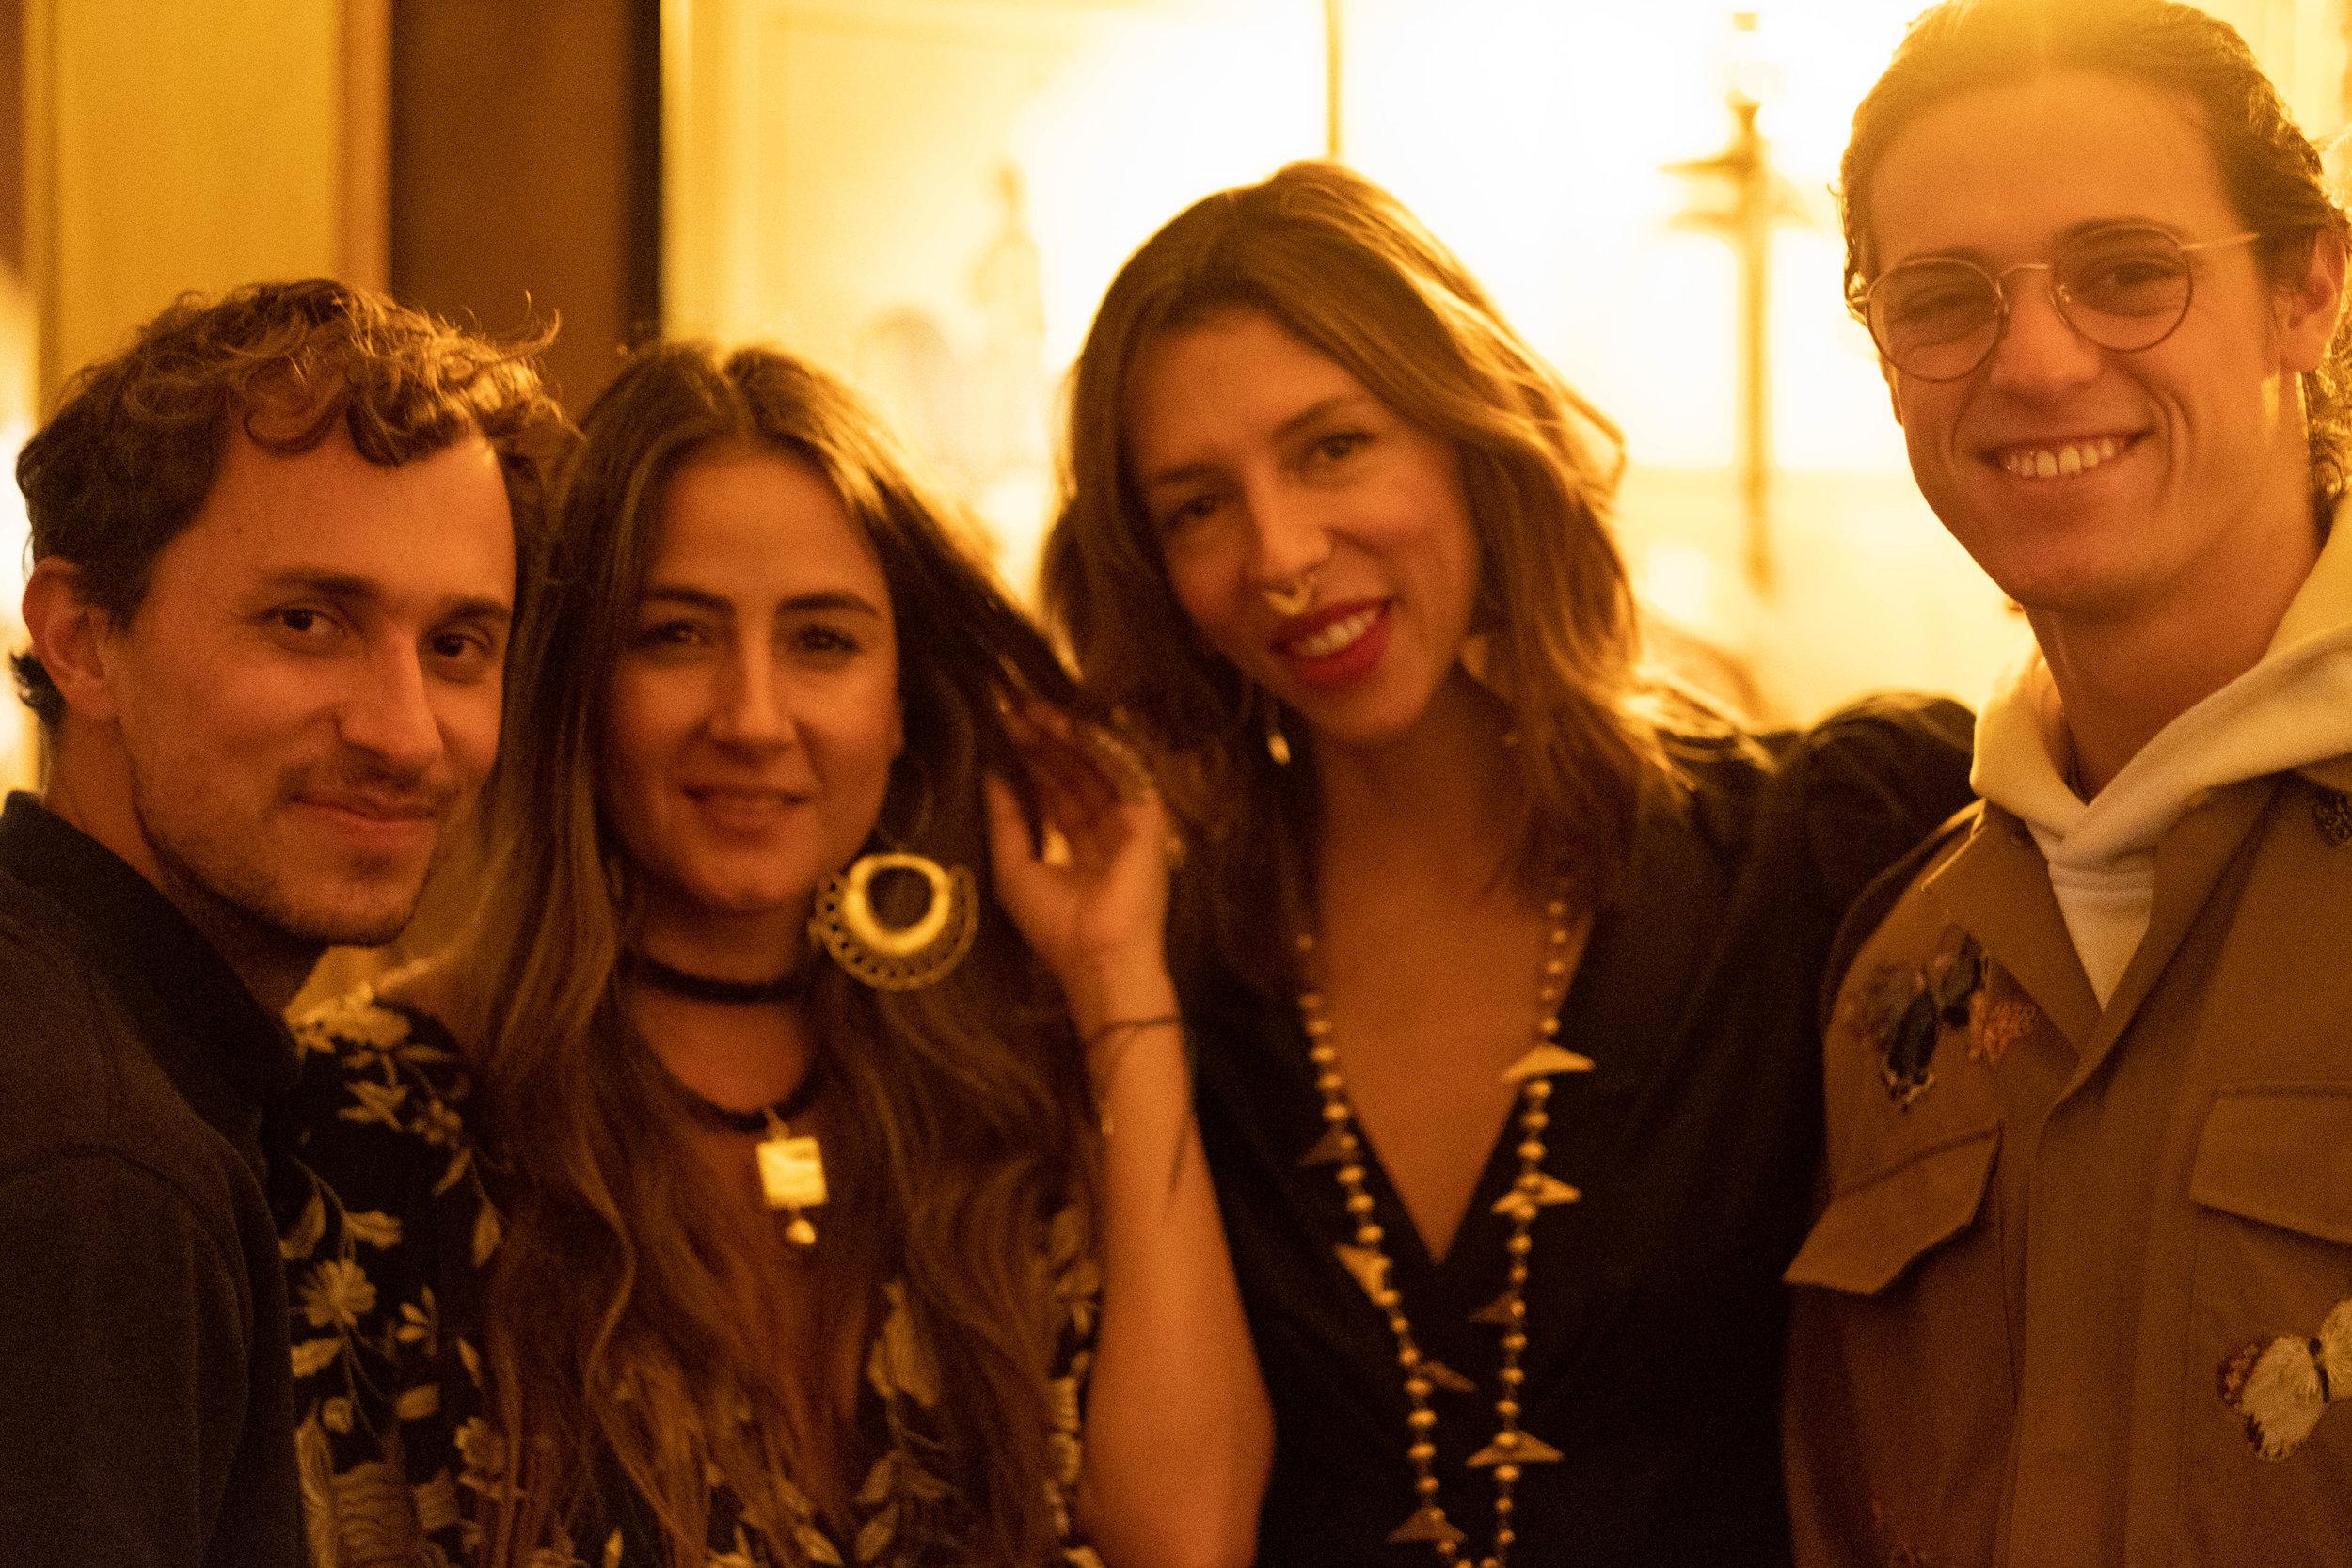 L-R: Colombian designers Esteban Cortazar and Johanna Ortiz, jewelry designer Paula Mendoza, and accessories designer Daniel Rueda-Sandoval.